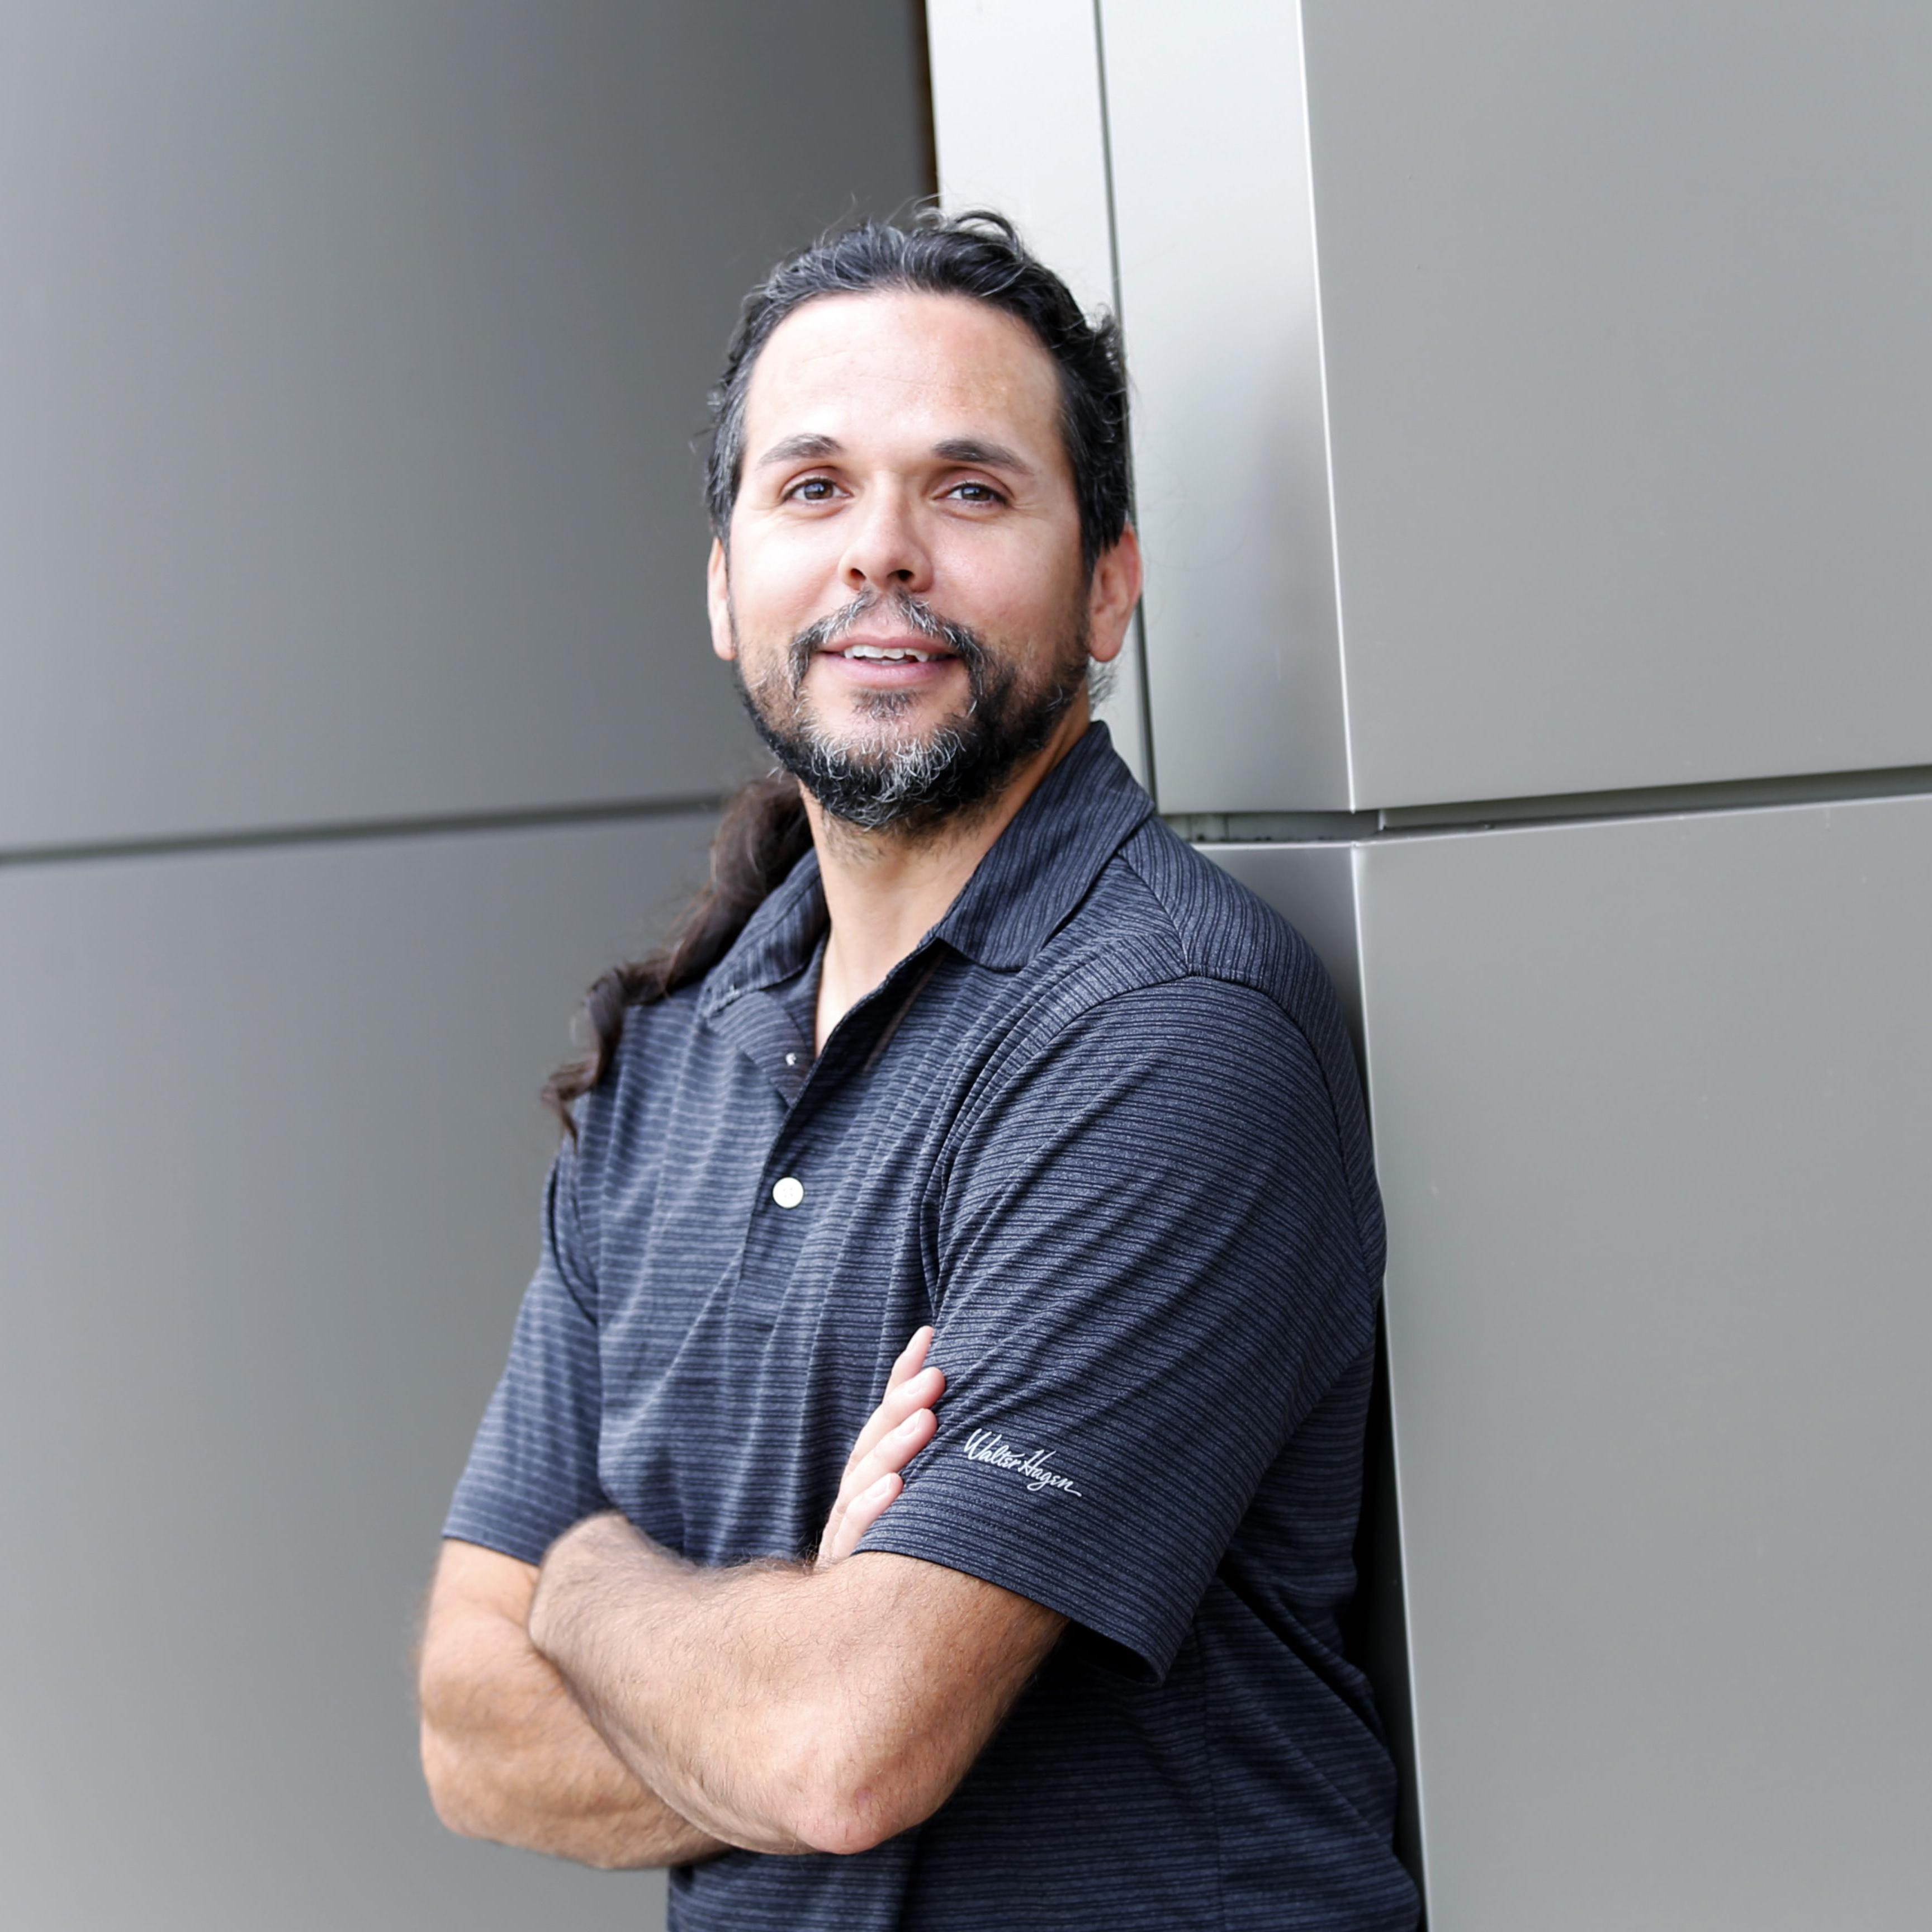 Jose Quiroz-Ziebart's Profile Photo